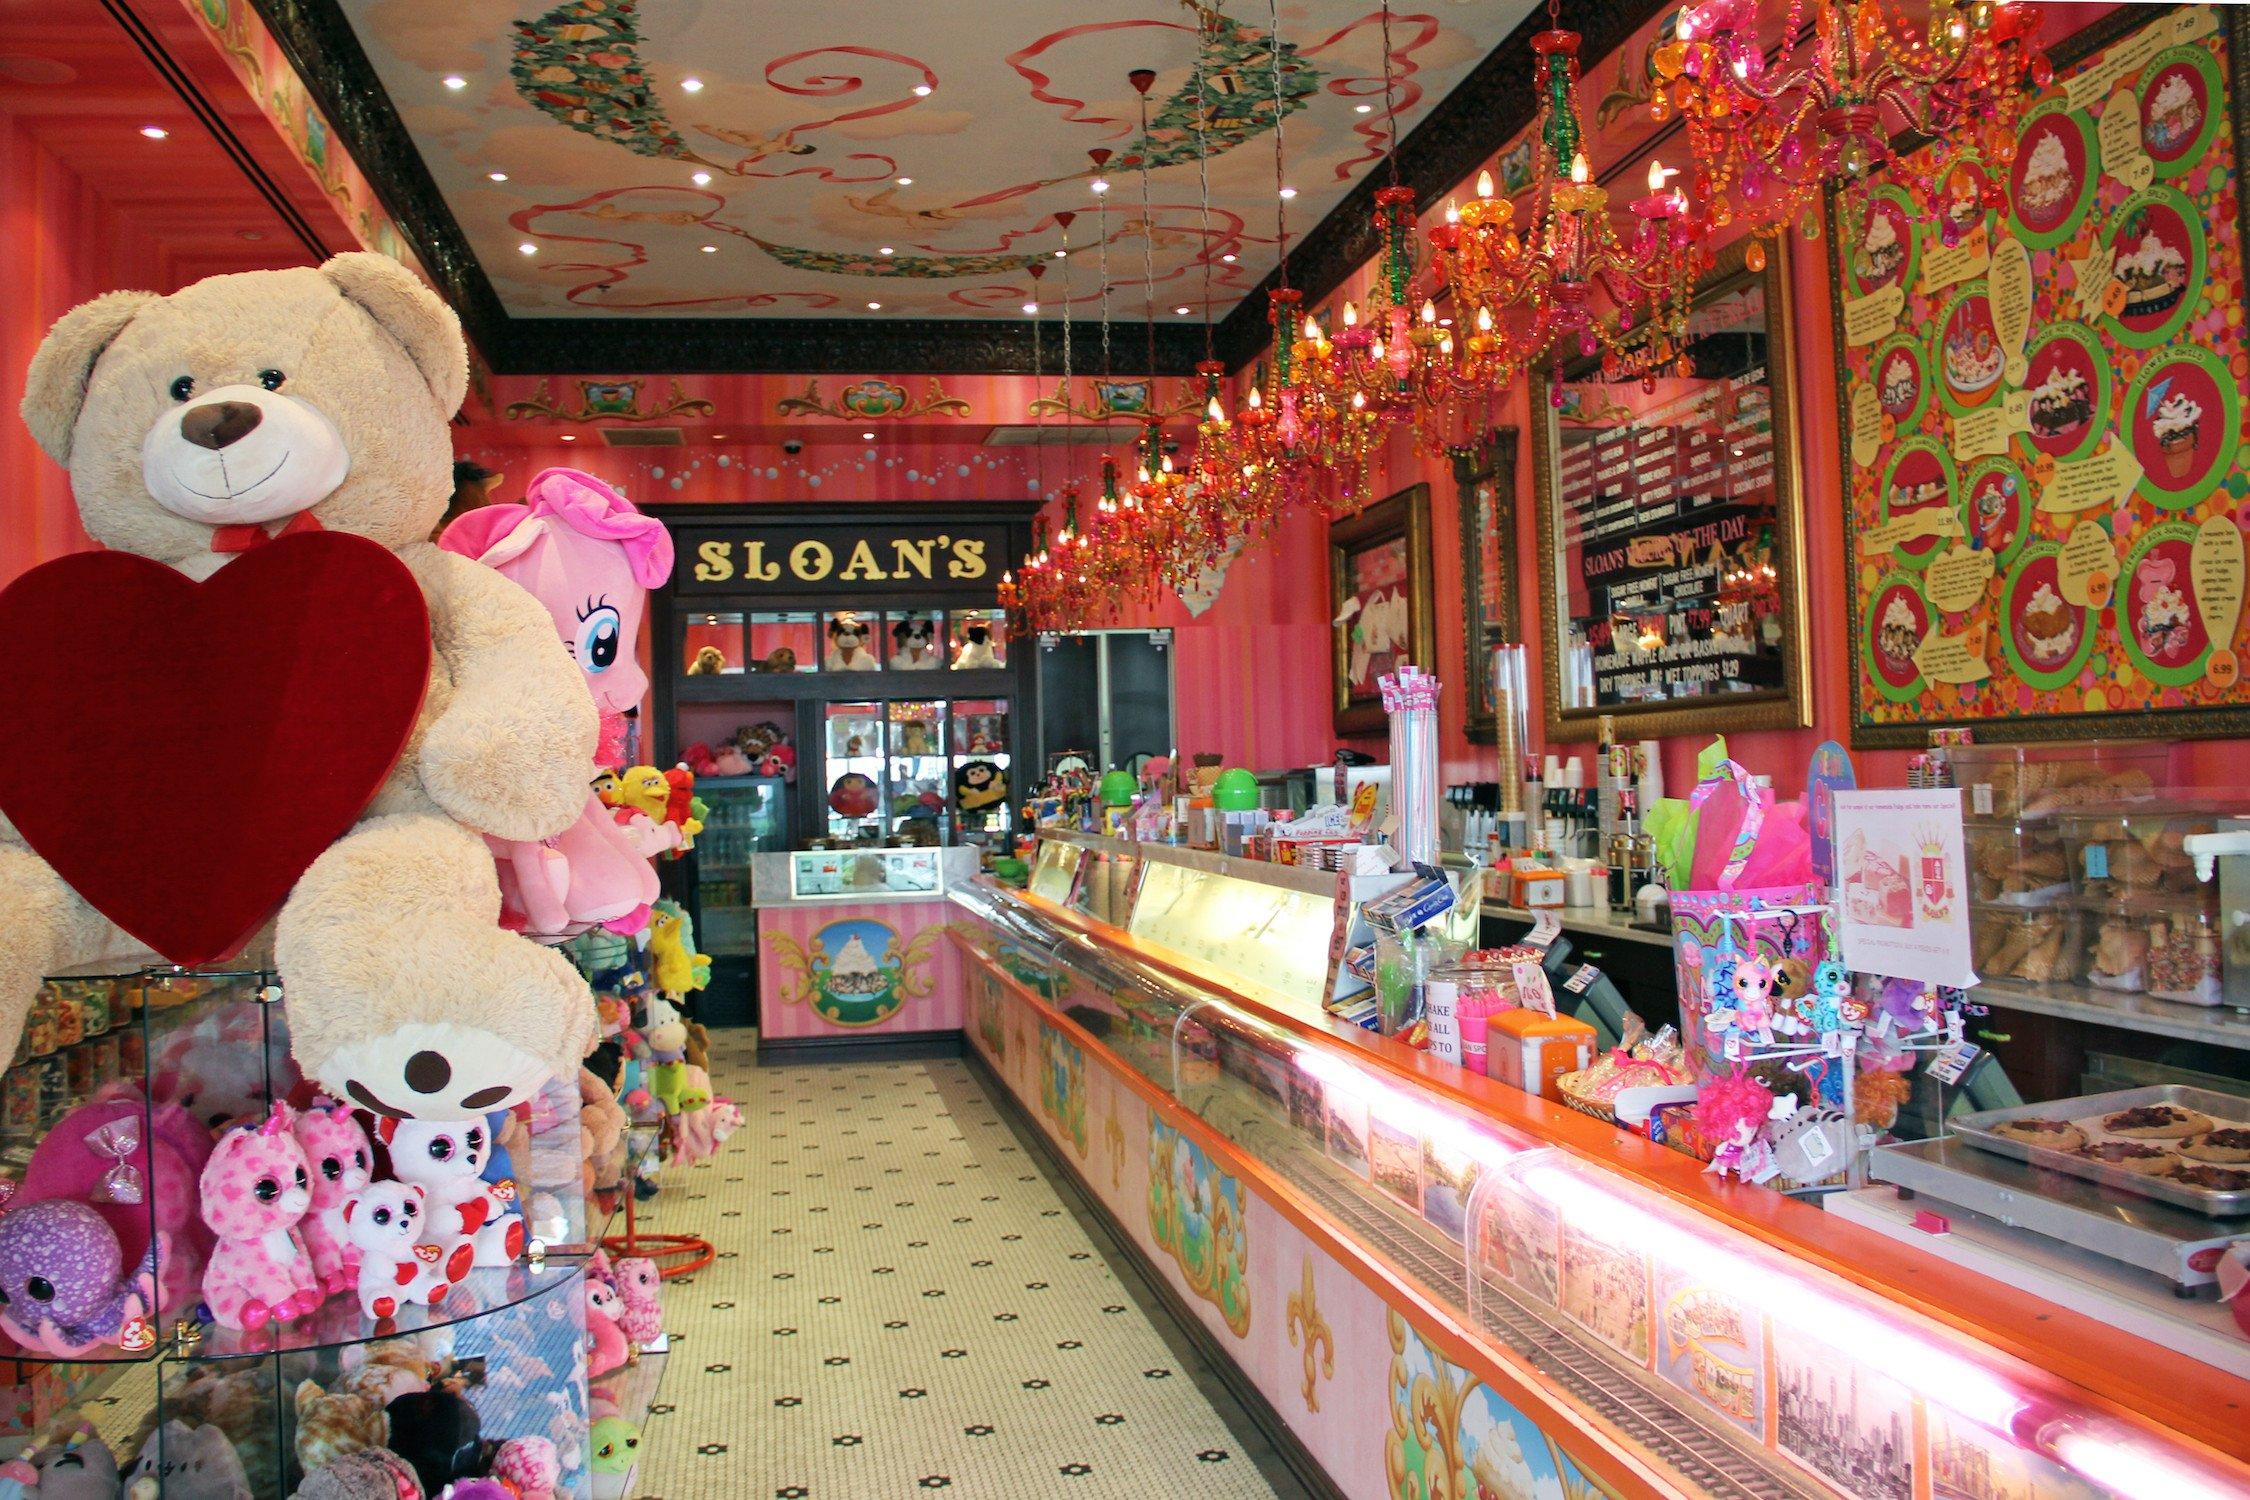 Floor Decor West Palm Beach Inspirational Palm Beach Gardens Sloan S Ice Cream Eat Palm Beach